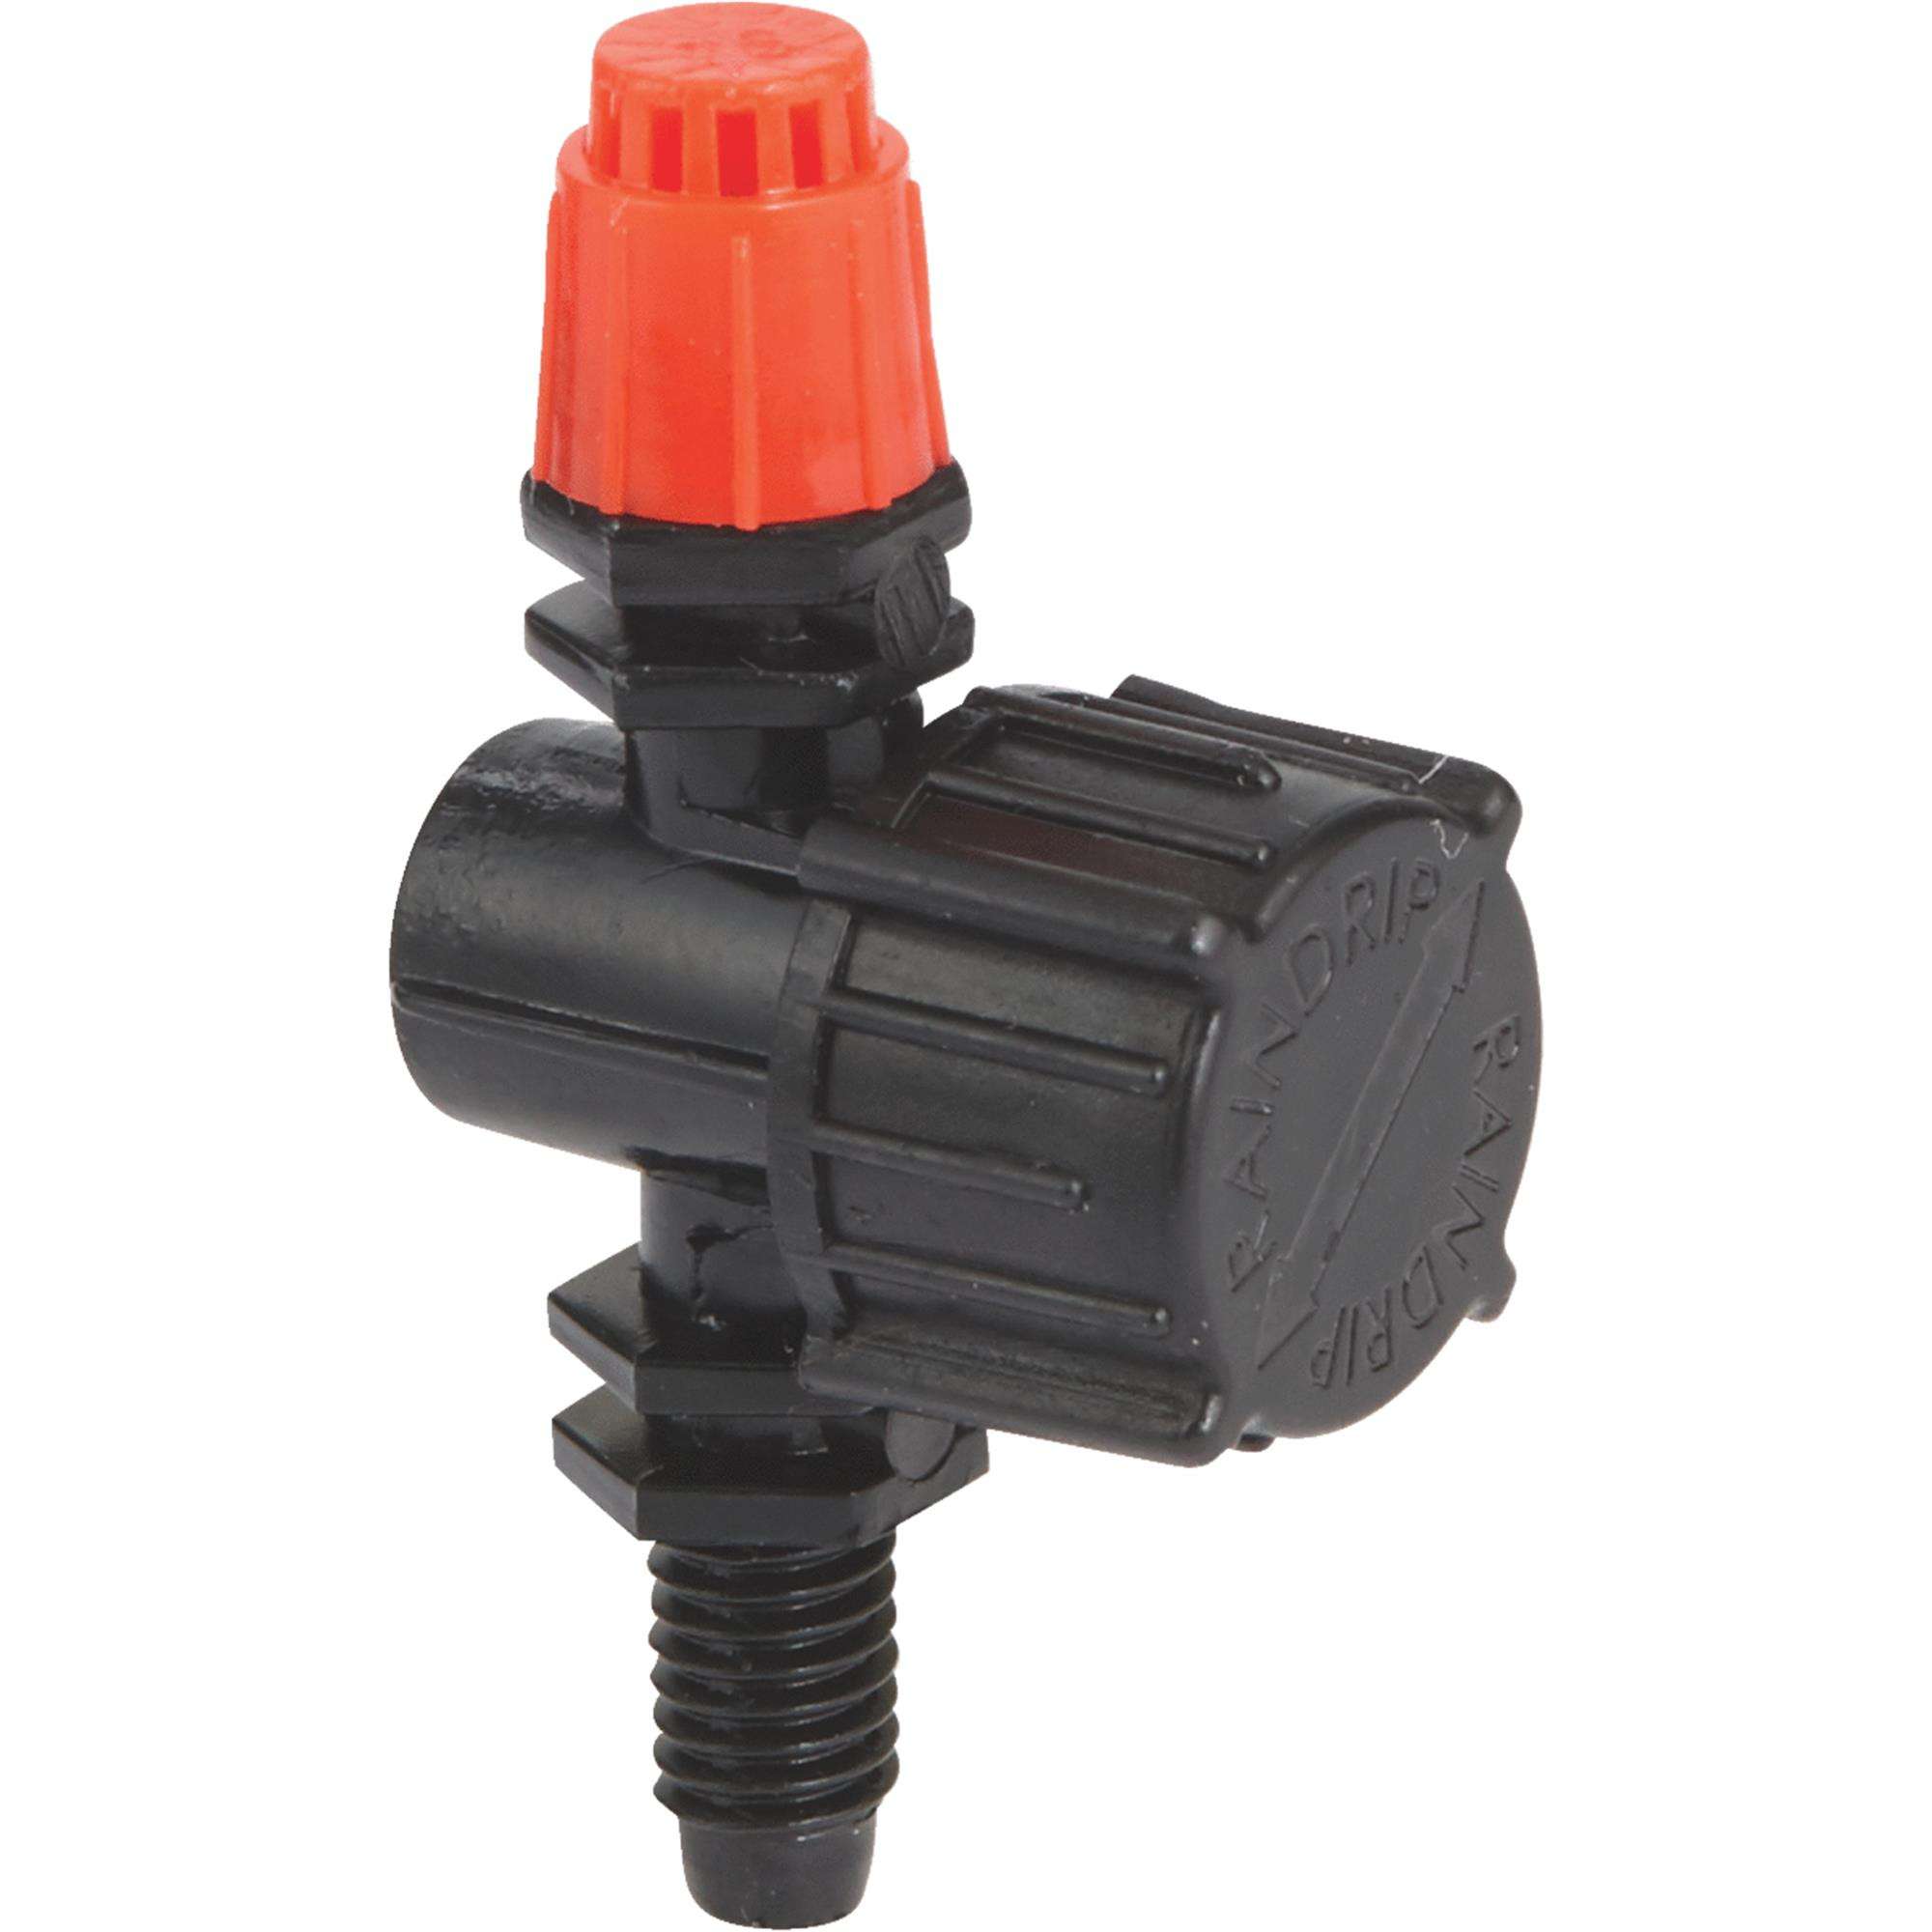 Rain Drip A180010B Full Circle Adjustable Stream Sprayer 10-Count